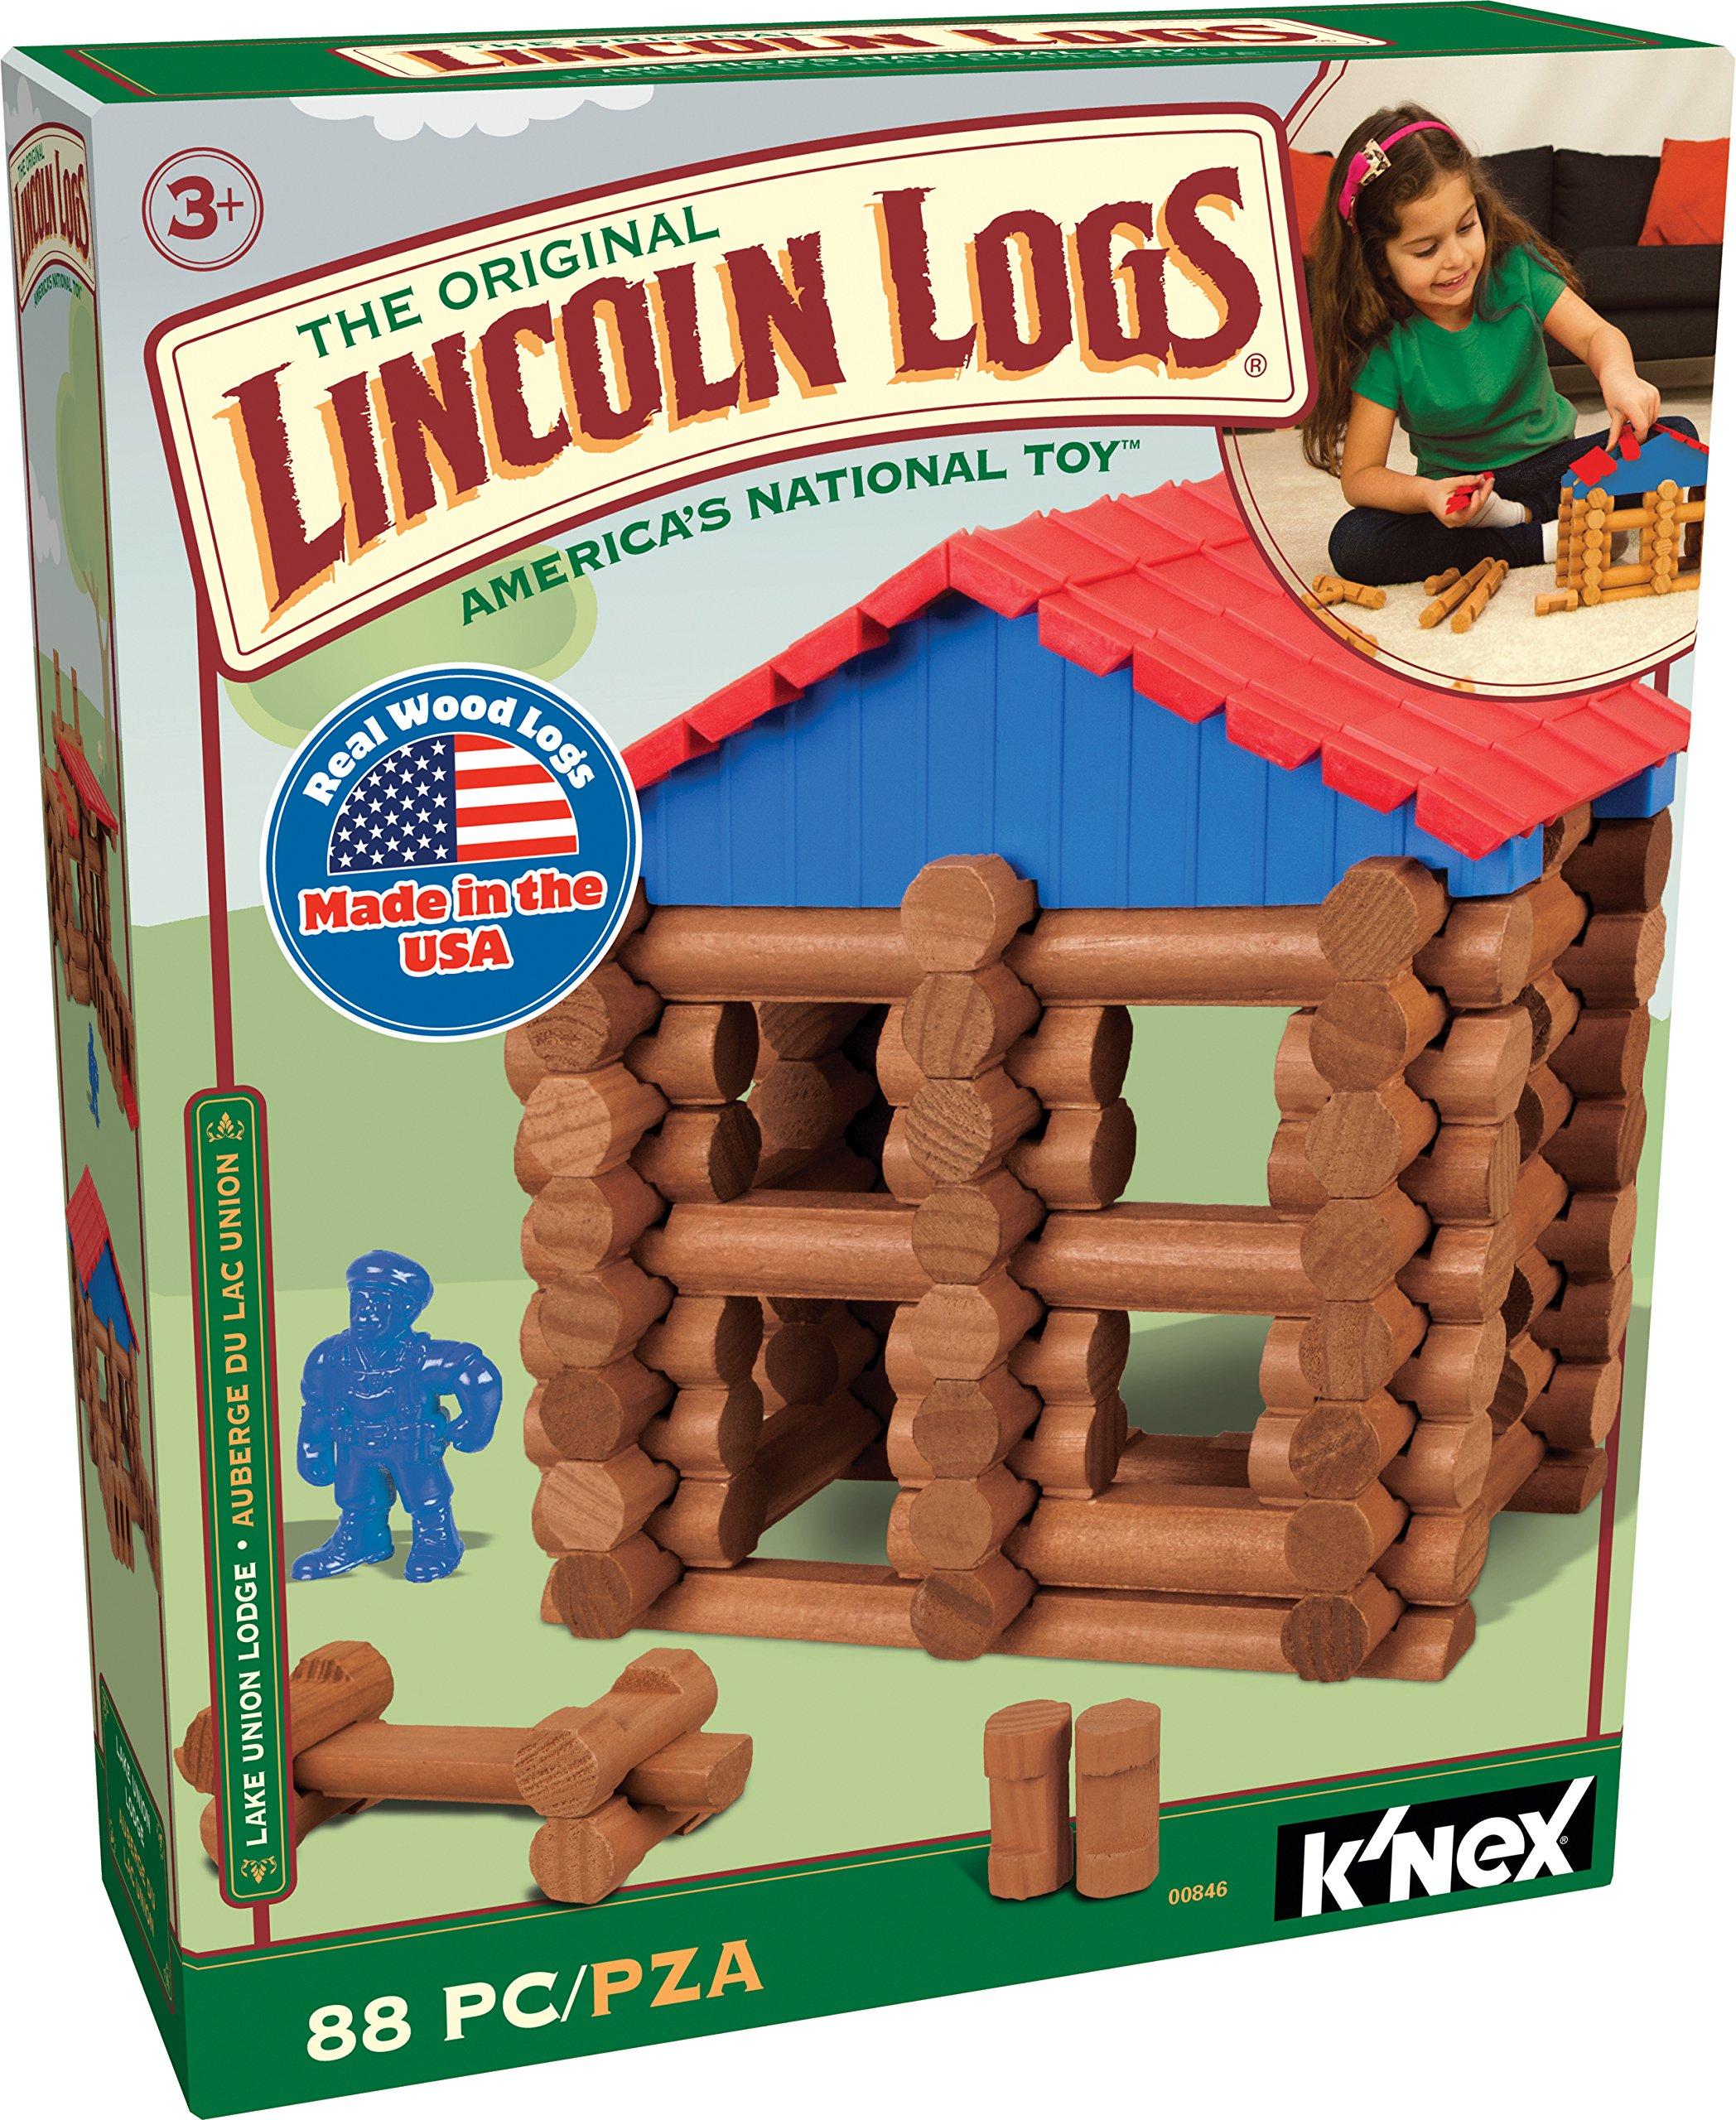 Lincoln Logs Lake Union Lodge 2